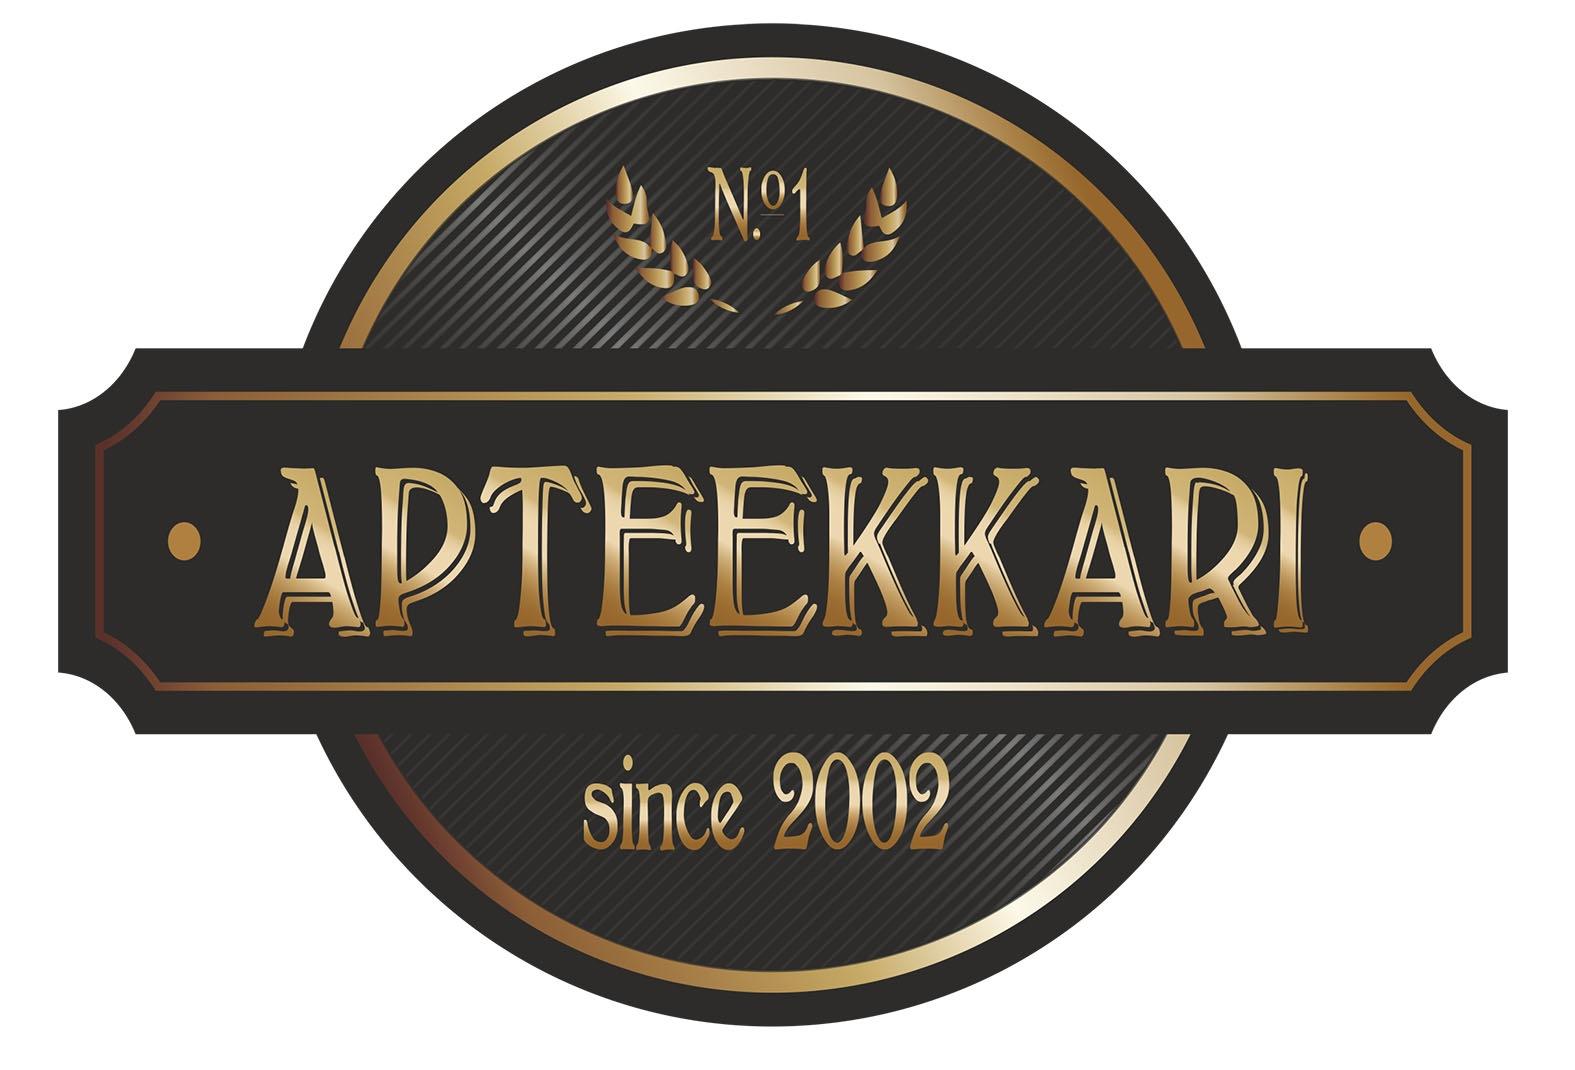 apteekkari_logo